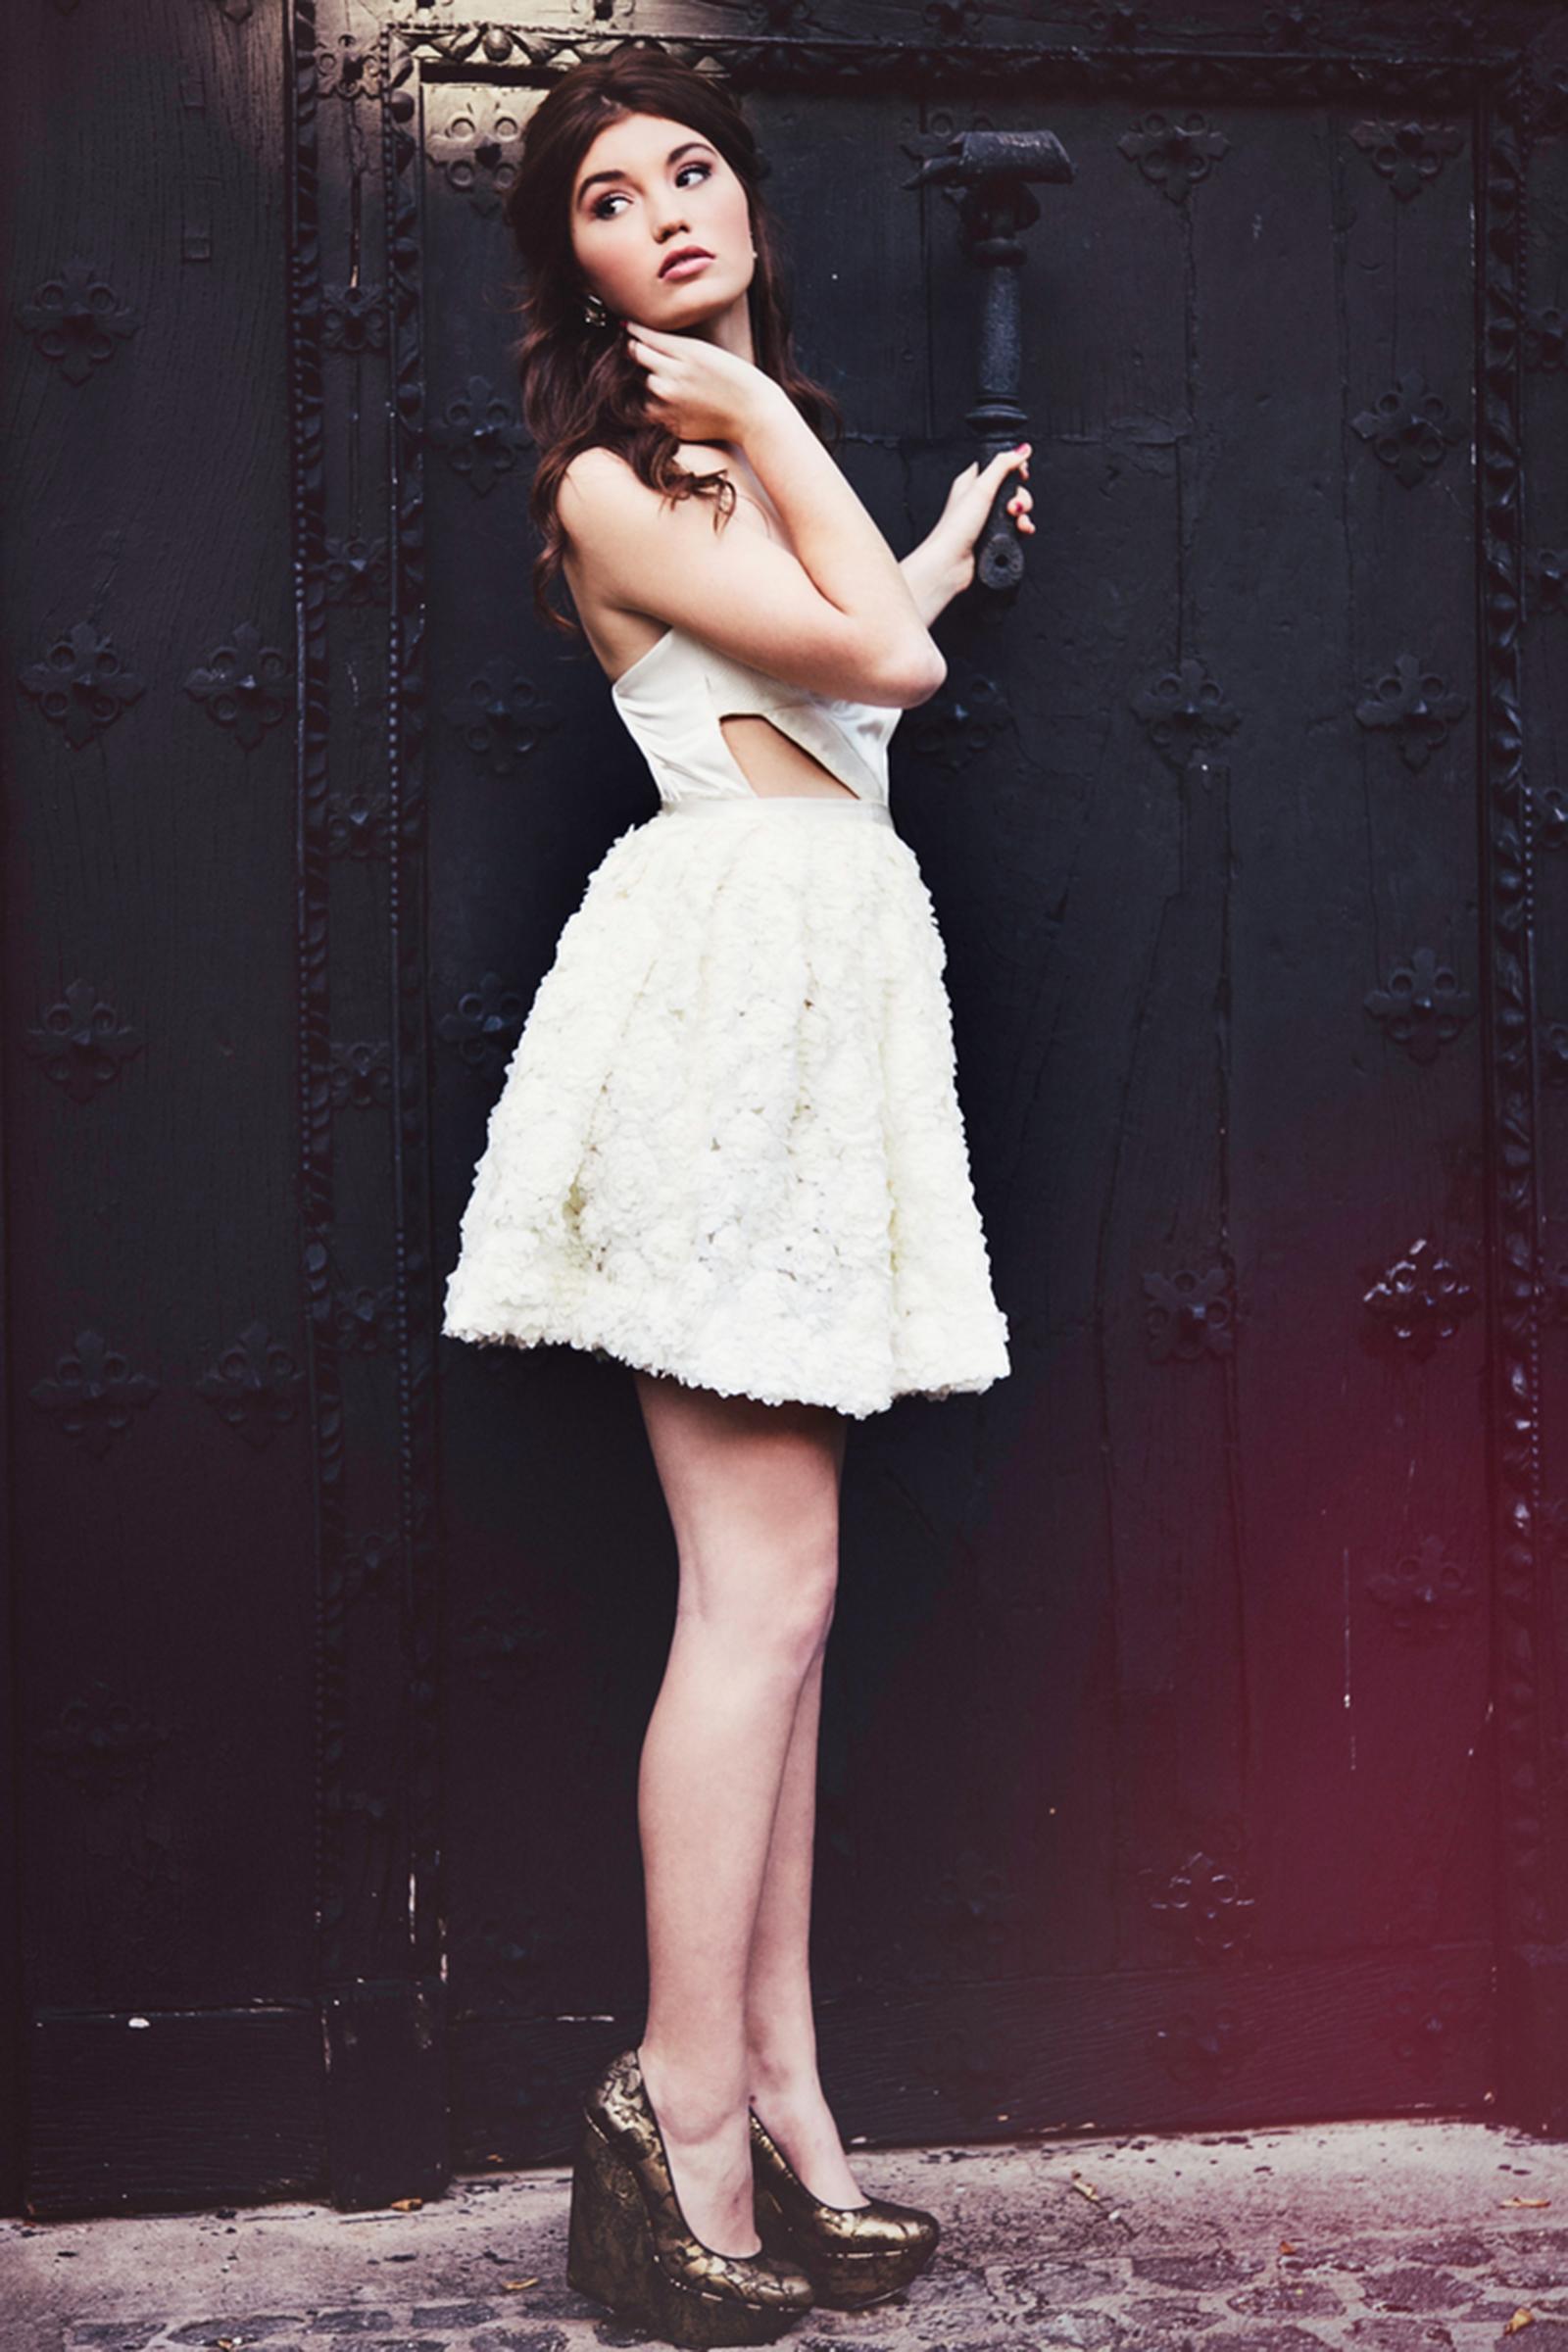 Evie+Lynn_By+Misha_AW13_Letterbox-22.jpg